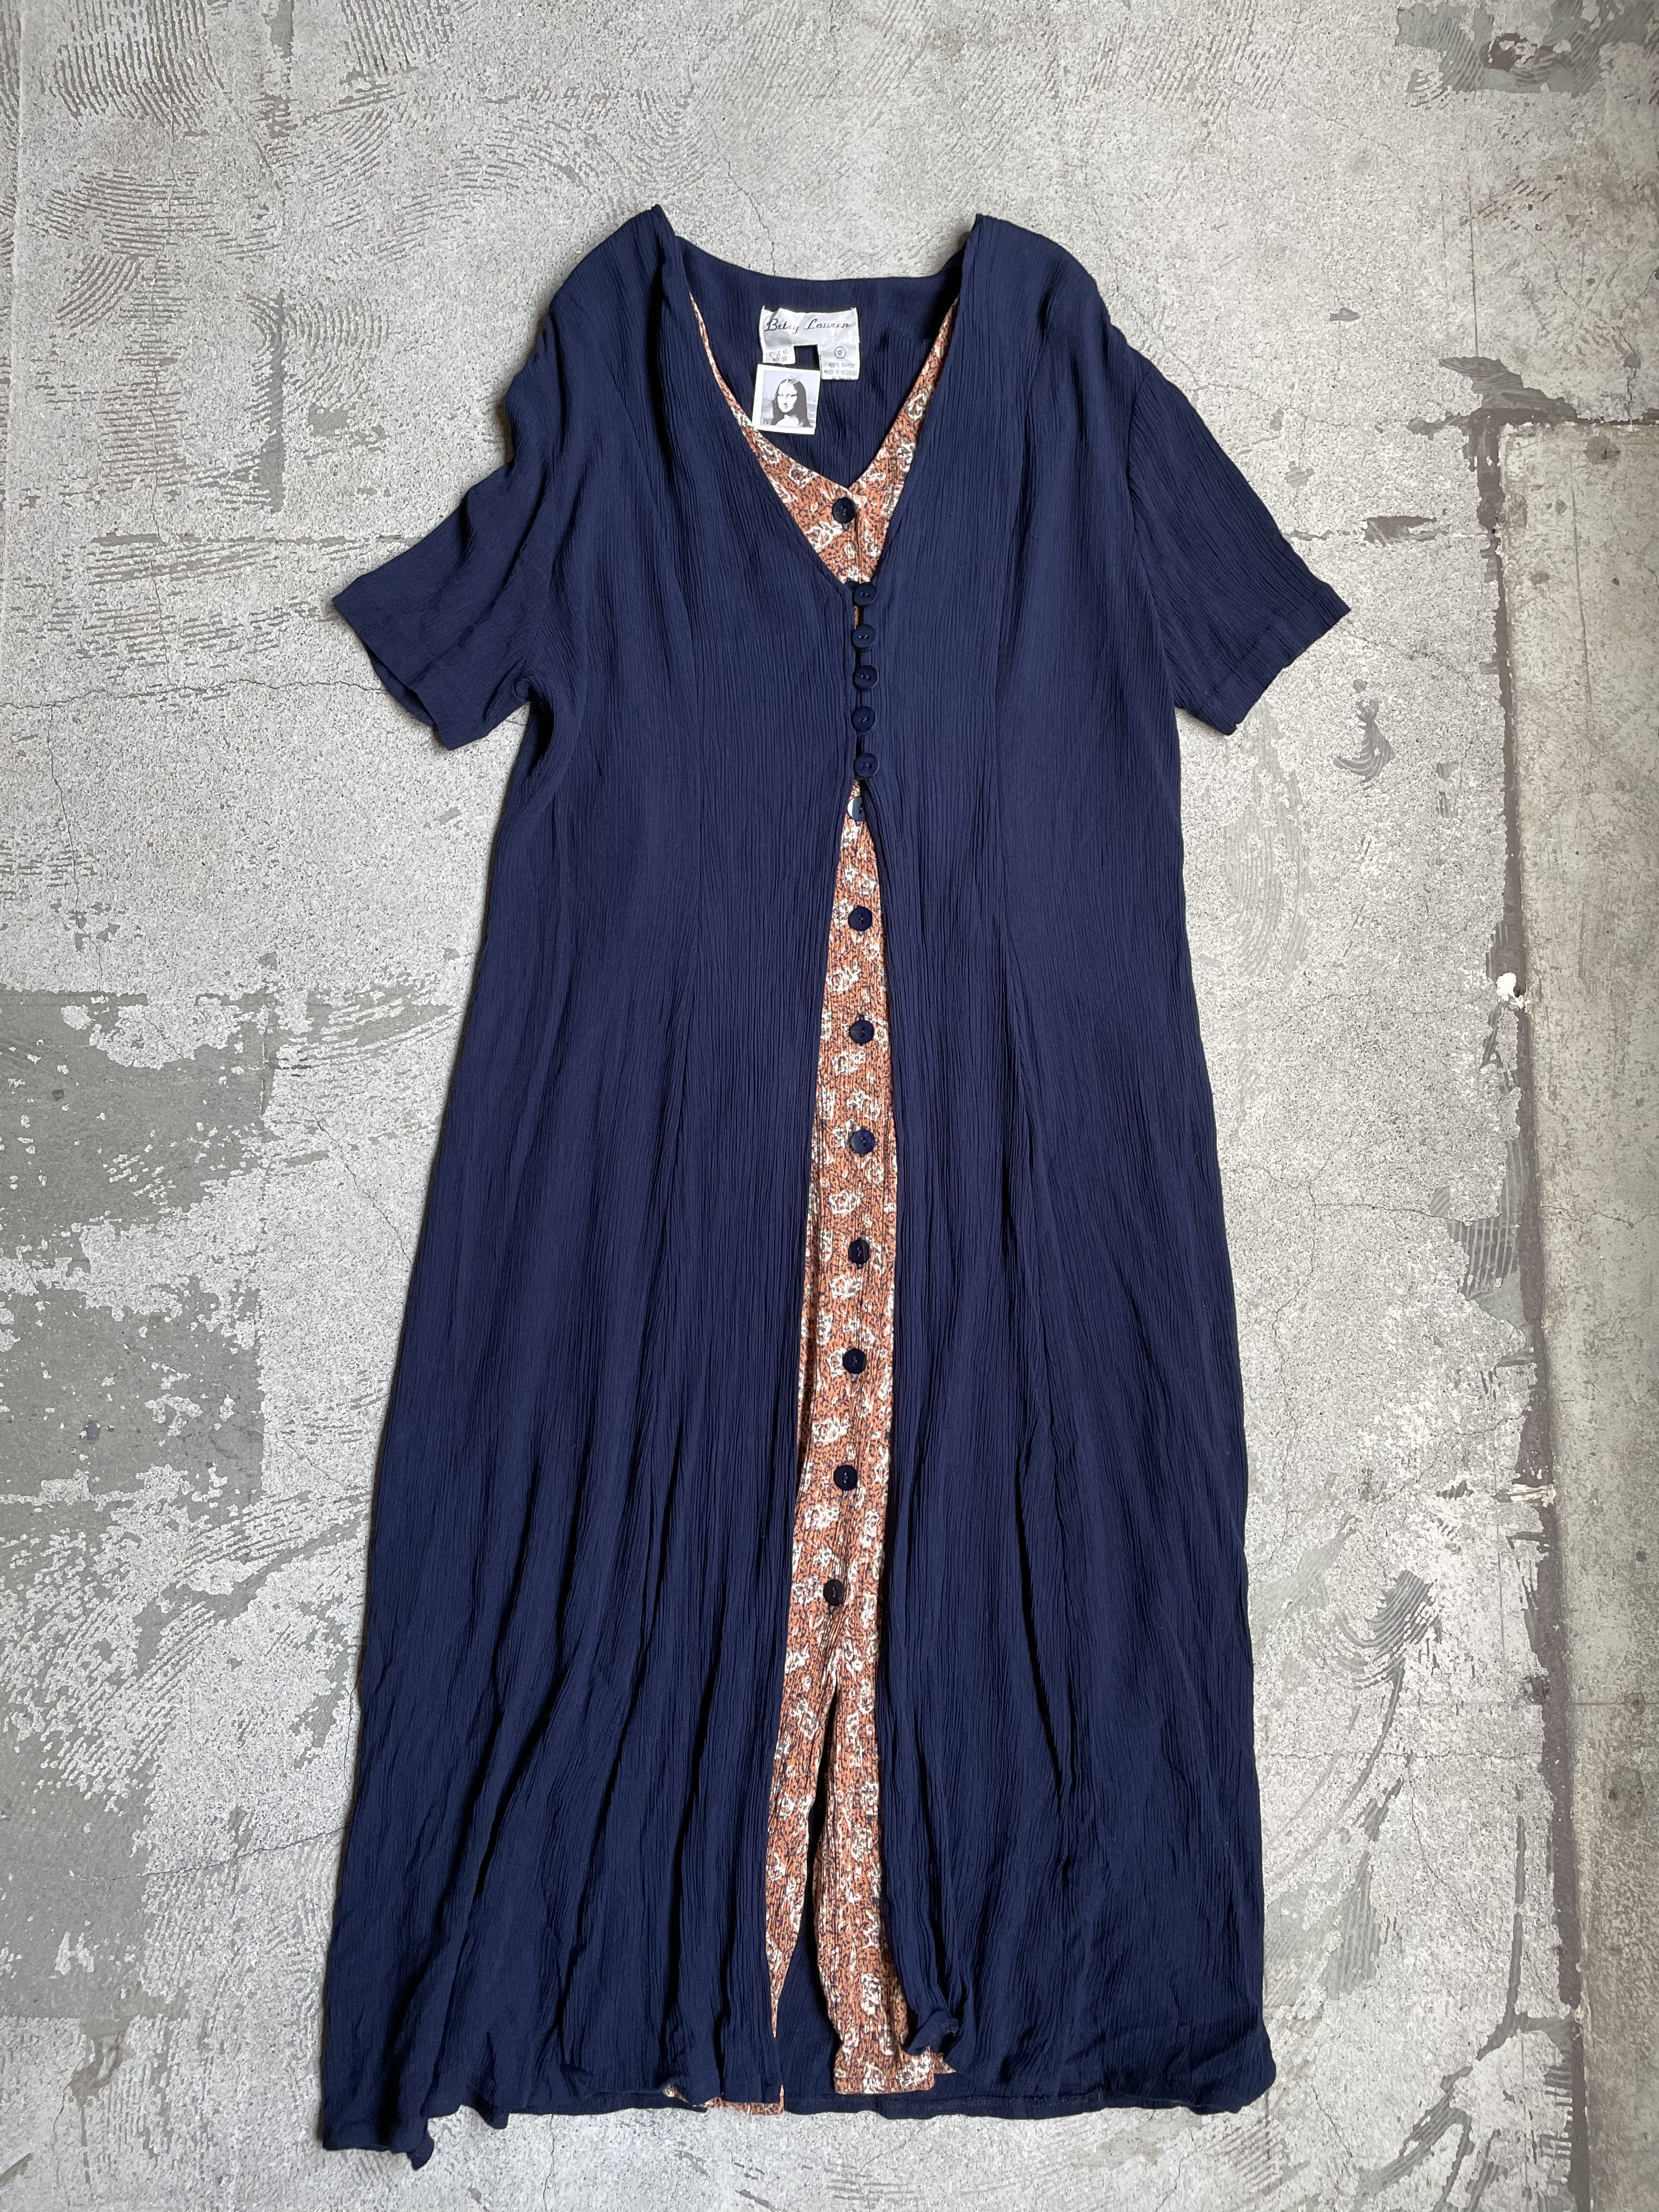 """Besty Lauren"" vintage rayon dress"